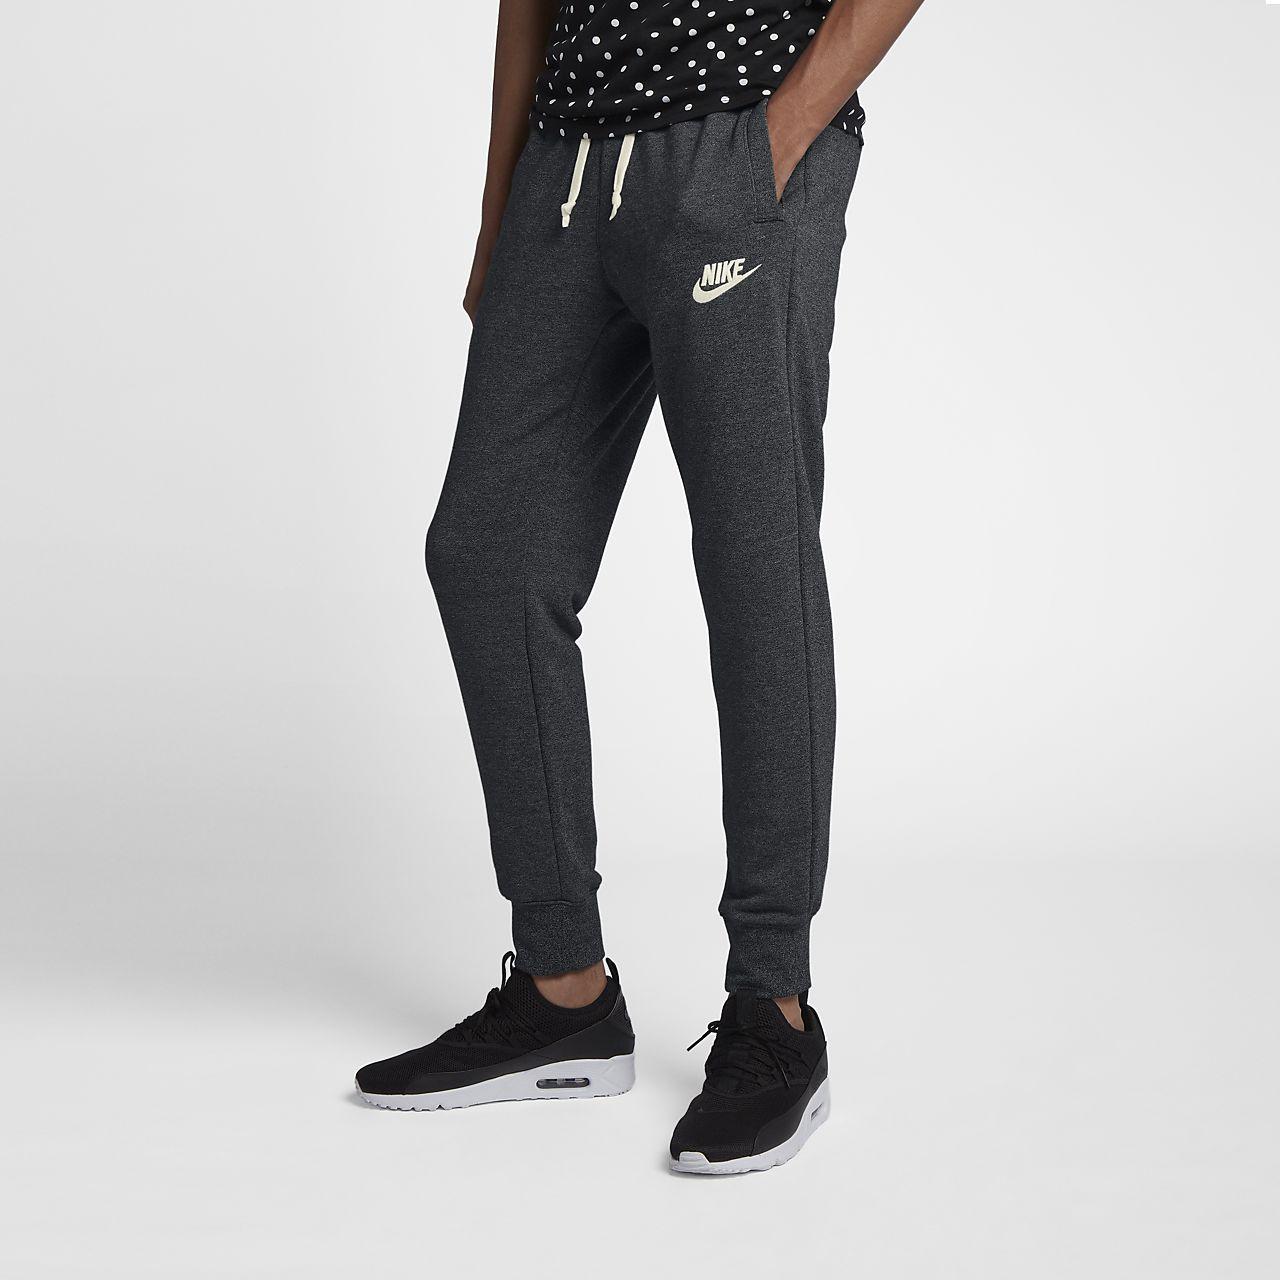 Fr Heritage Pantalon Nike Homme De Sportswear Jogging Pour ErqqI60gn